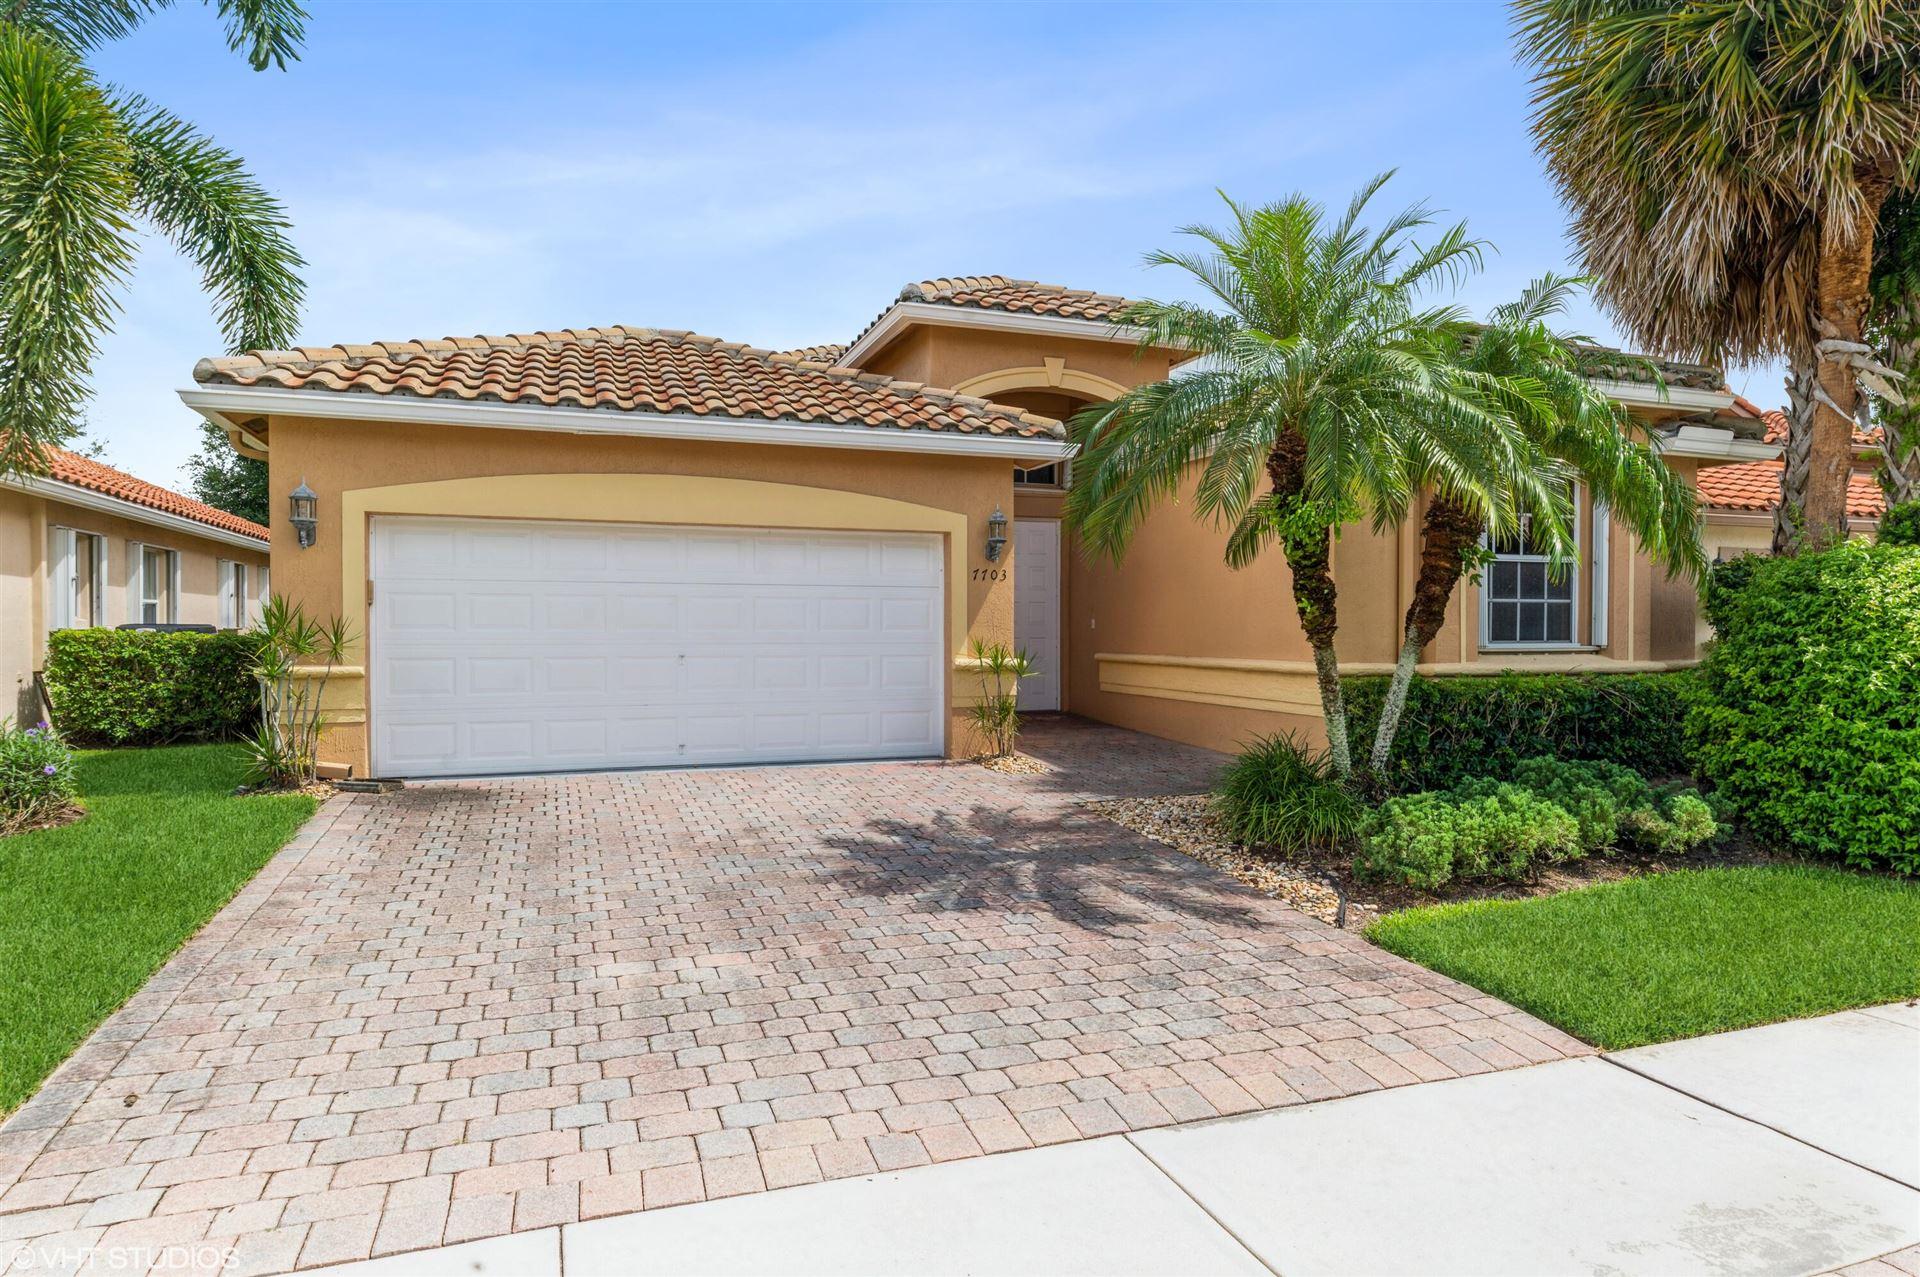 7703 Caprio Drive, Boynton Beach, FL 33472 - #: RX-10747056